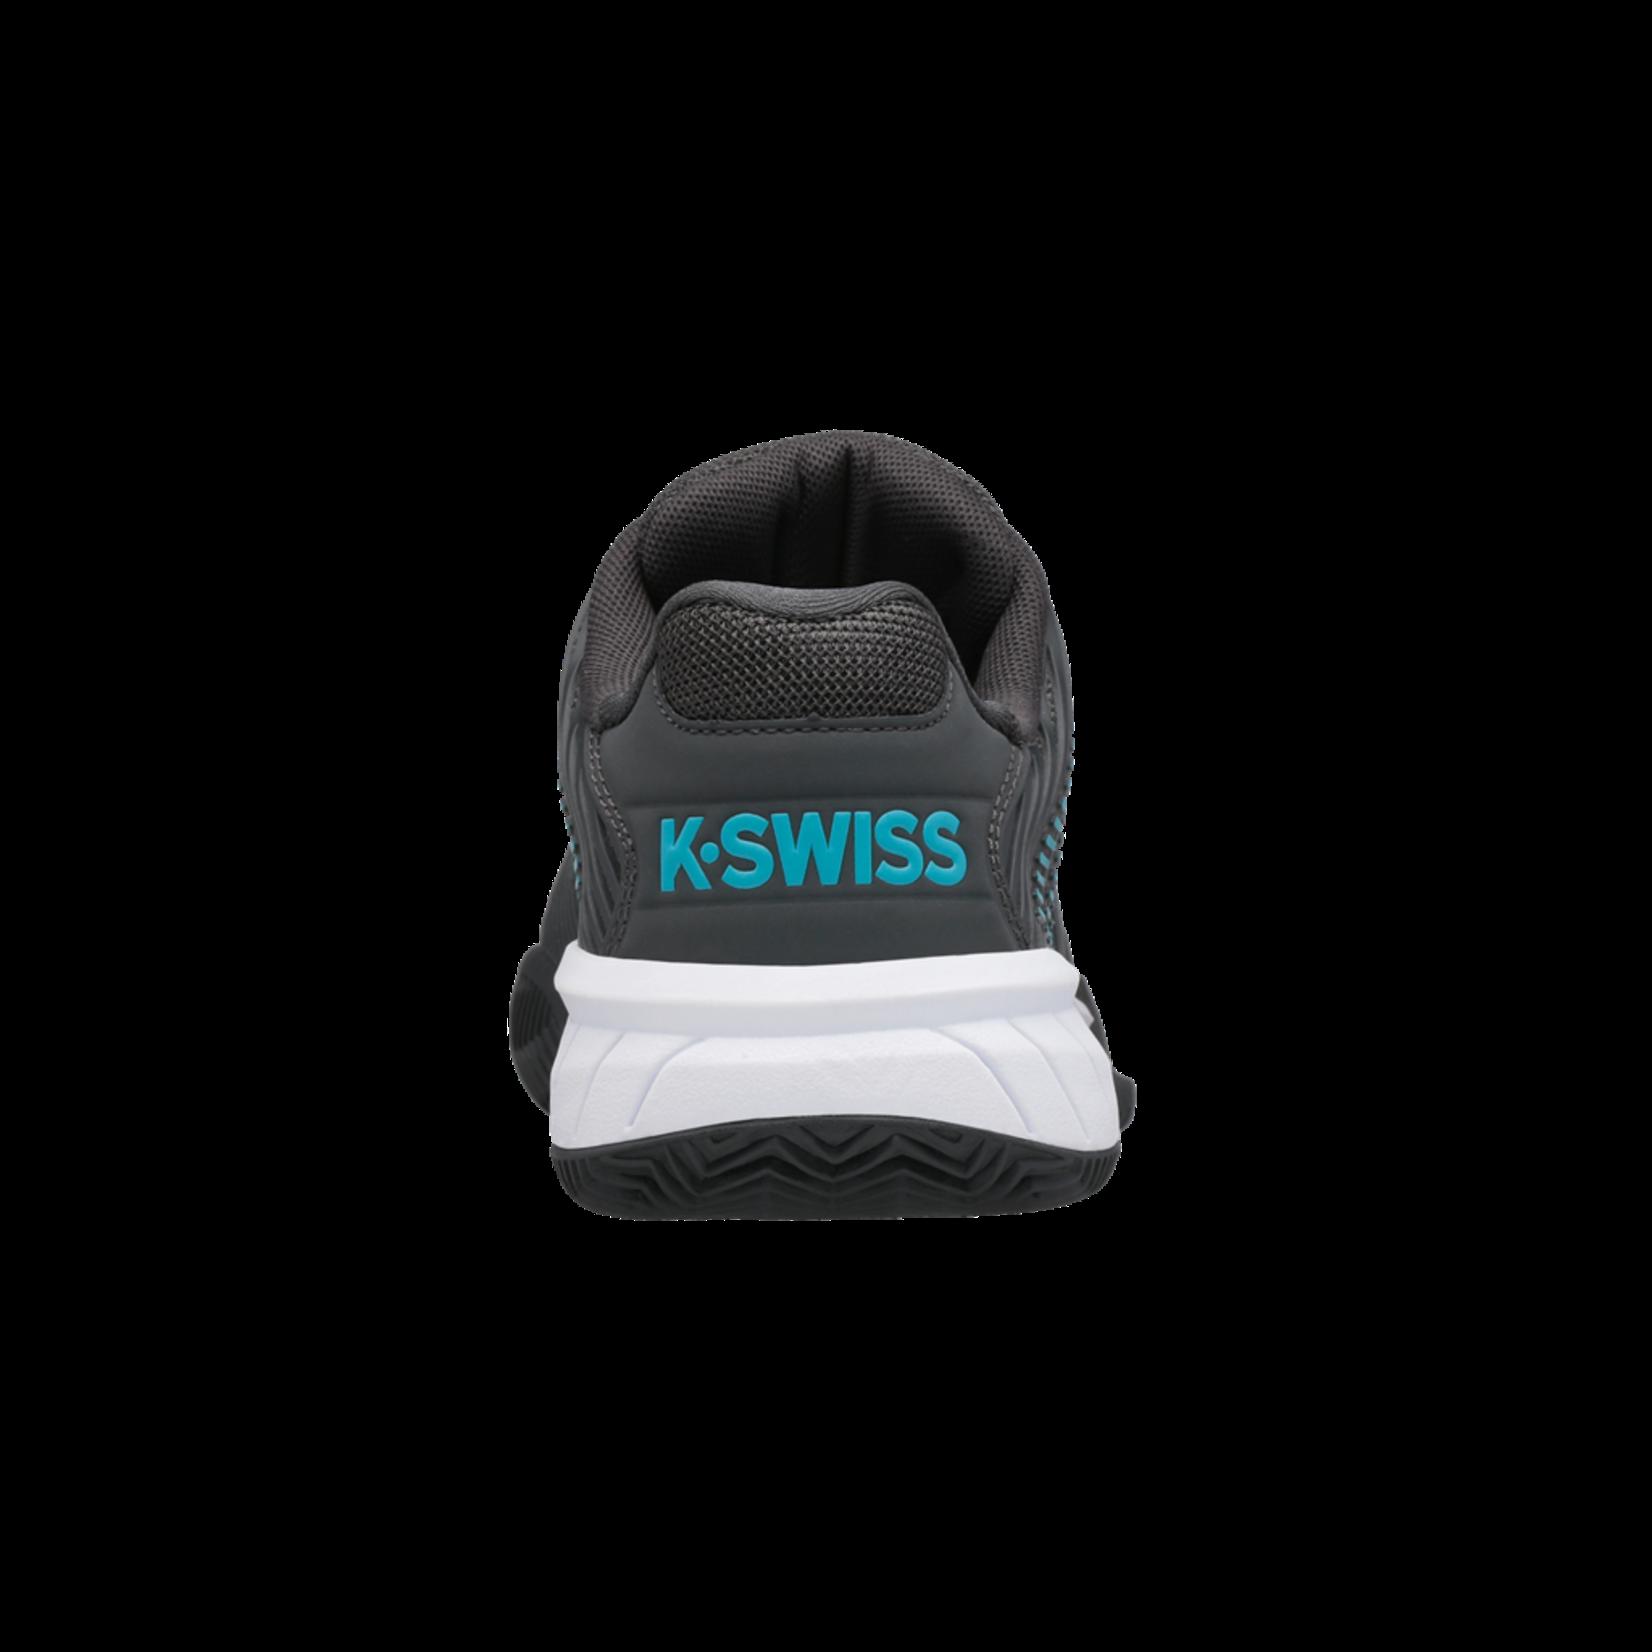 K-Swiss Jeugd - Hypercourt Express Clay - Grijs/Blauw